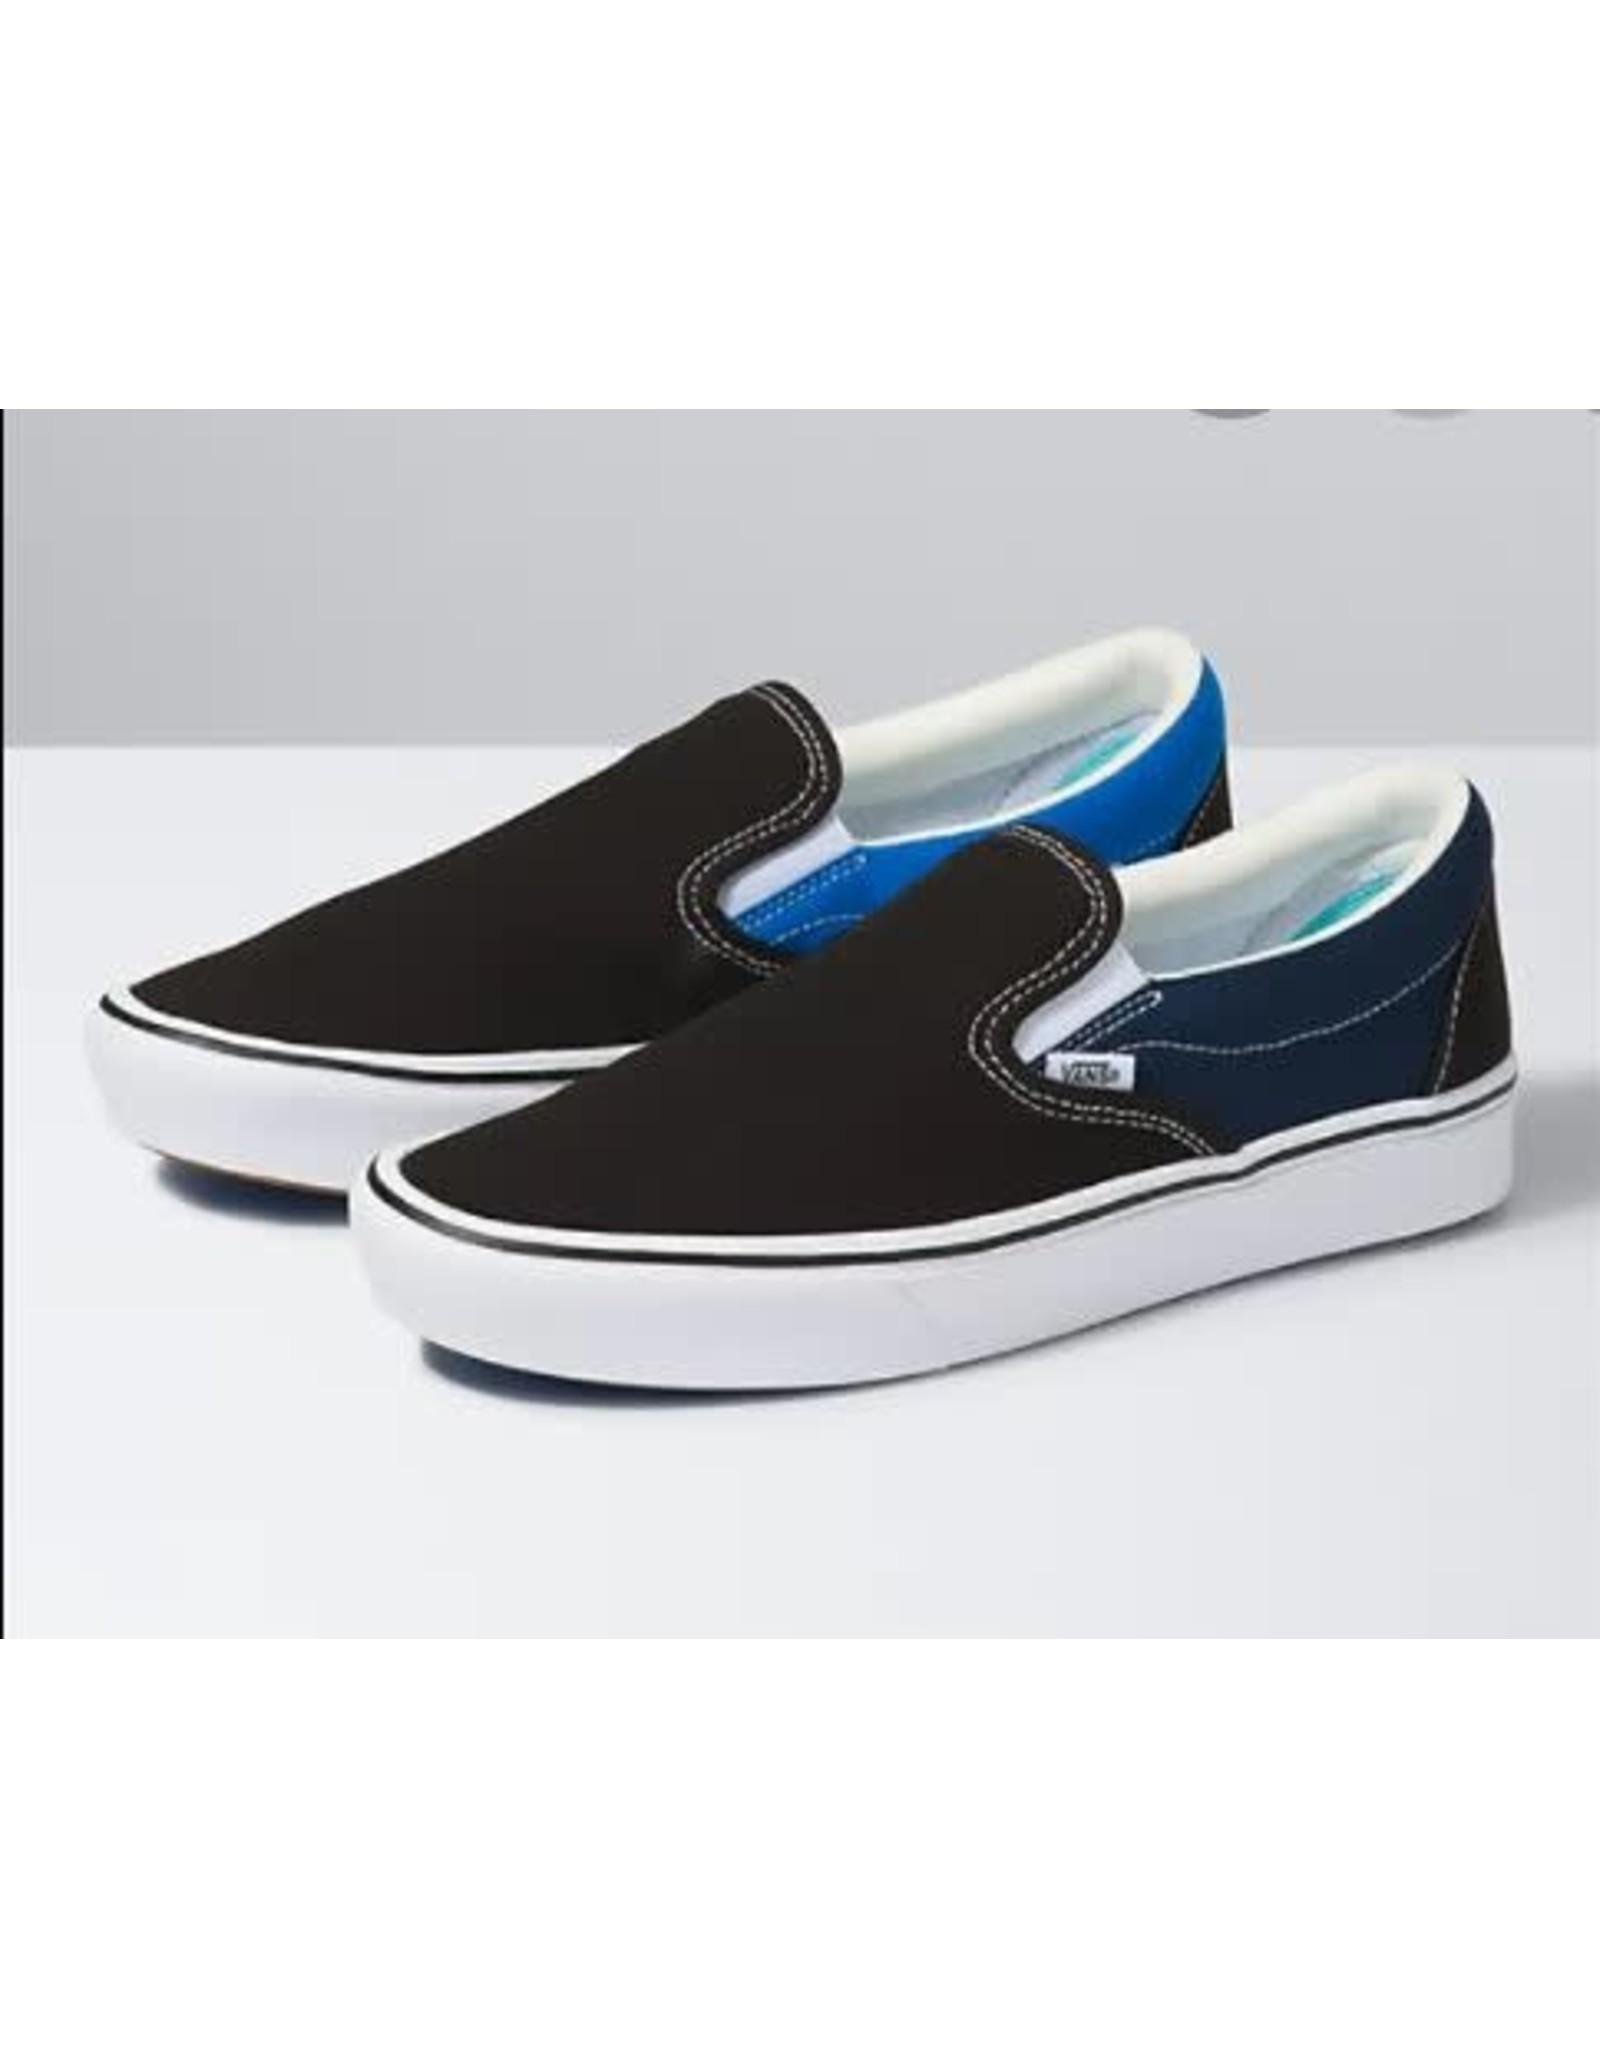 Vans Comfycush Slip-On Tri-Tone Shoe